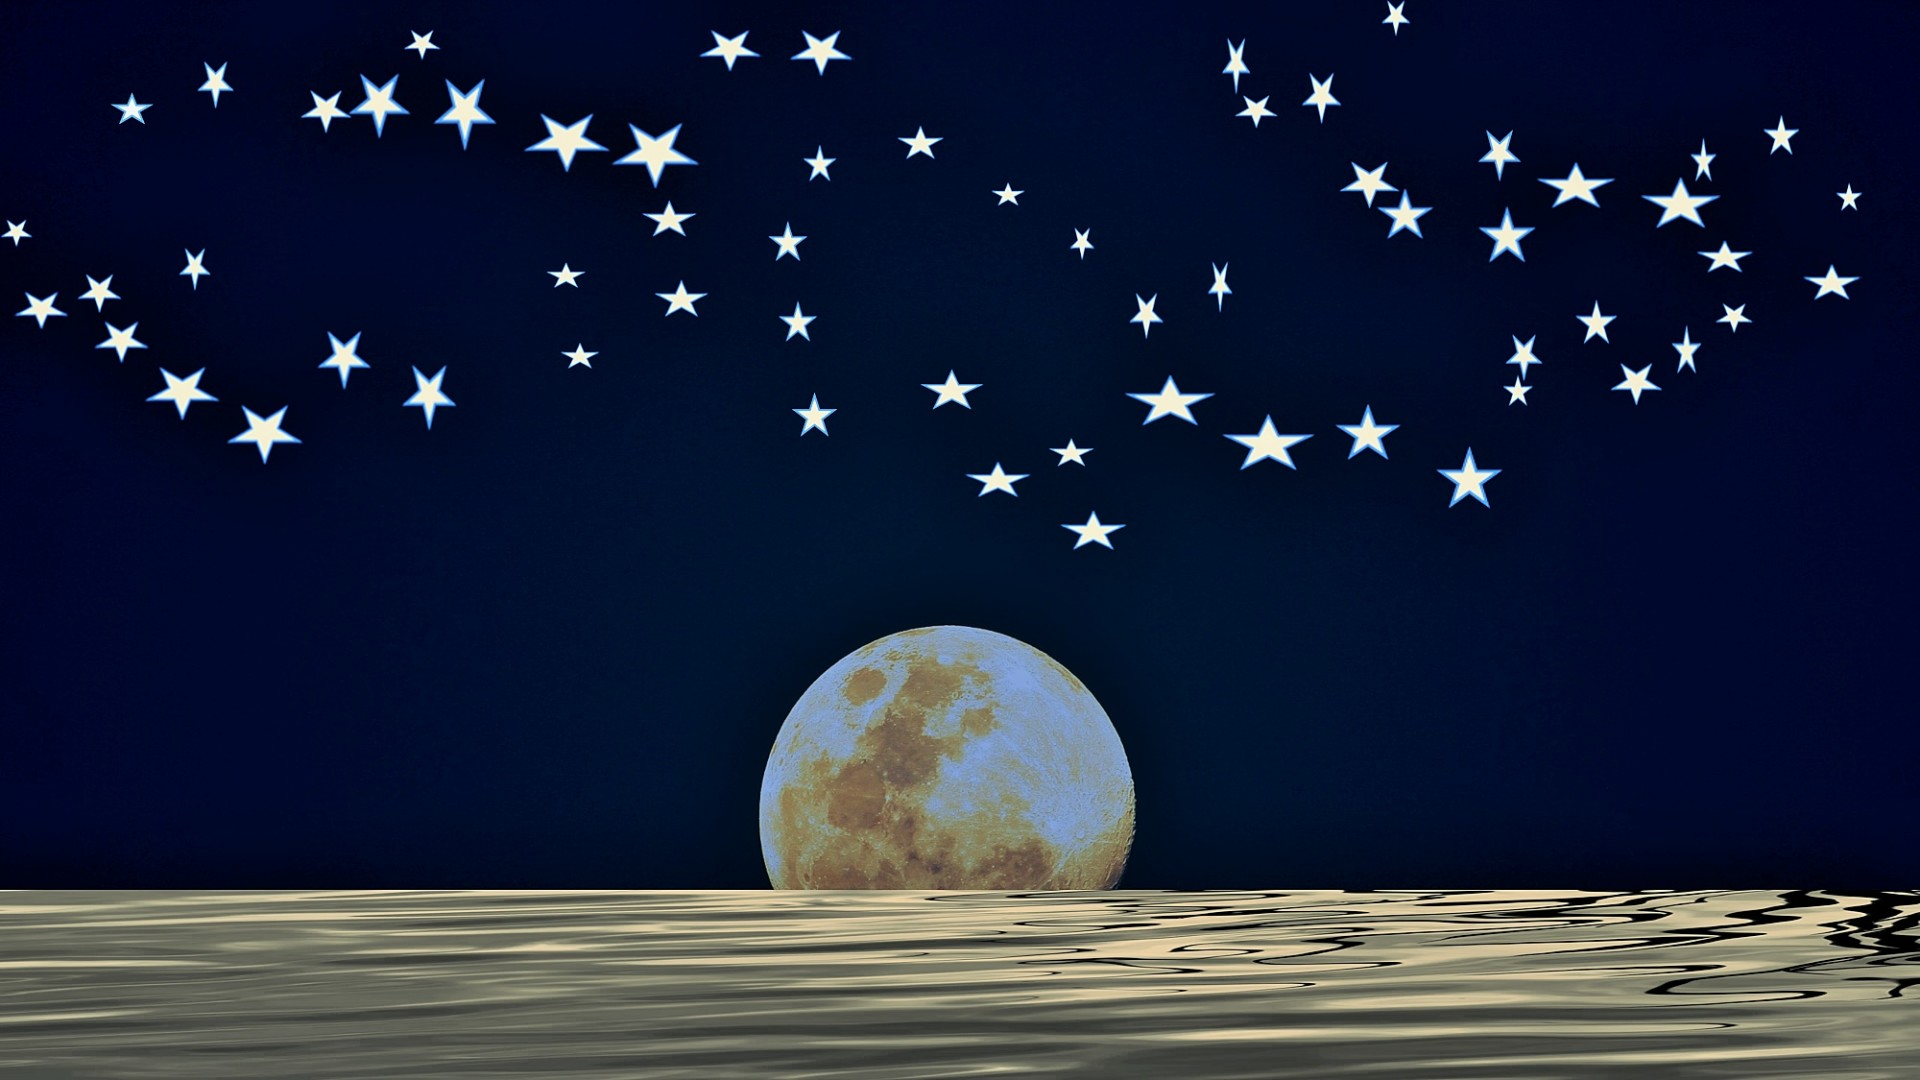 Moon Wallpaper Hd Full Moon With Midnight Sky Free Stock Photo Public